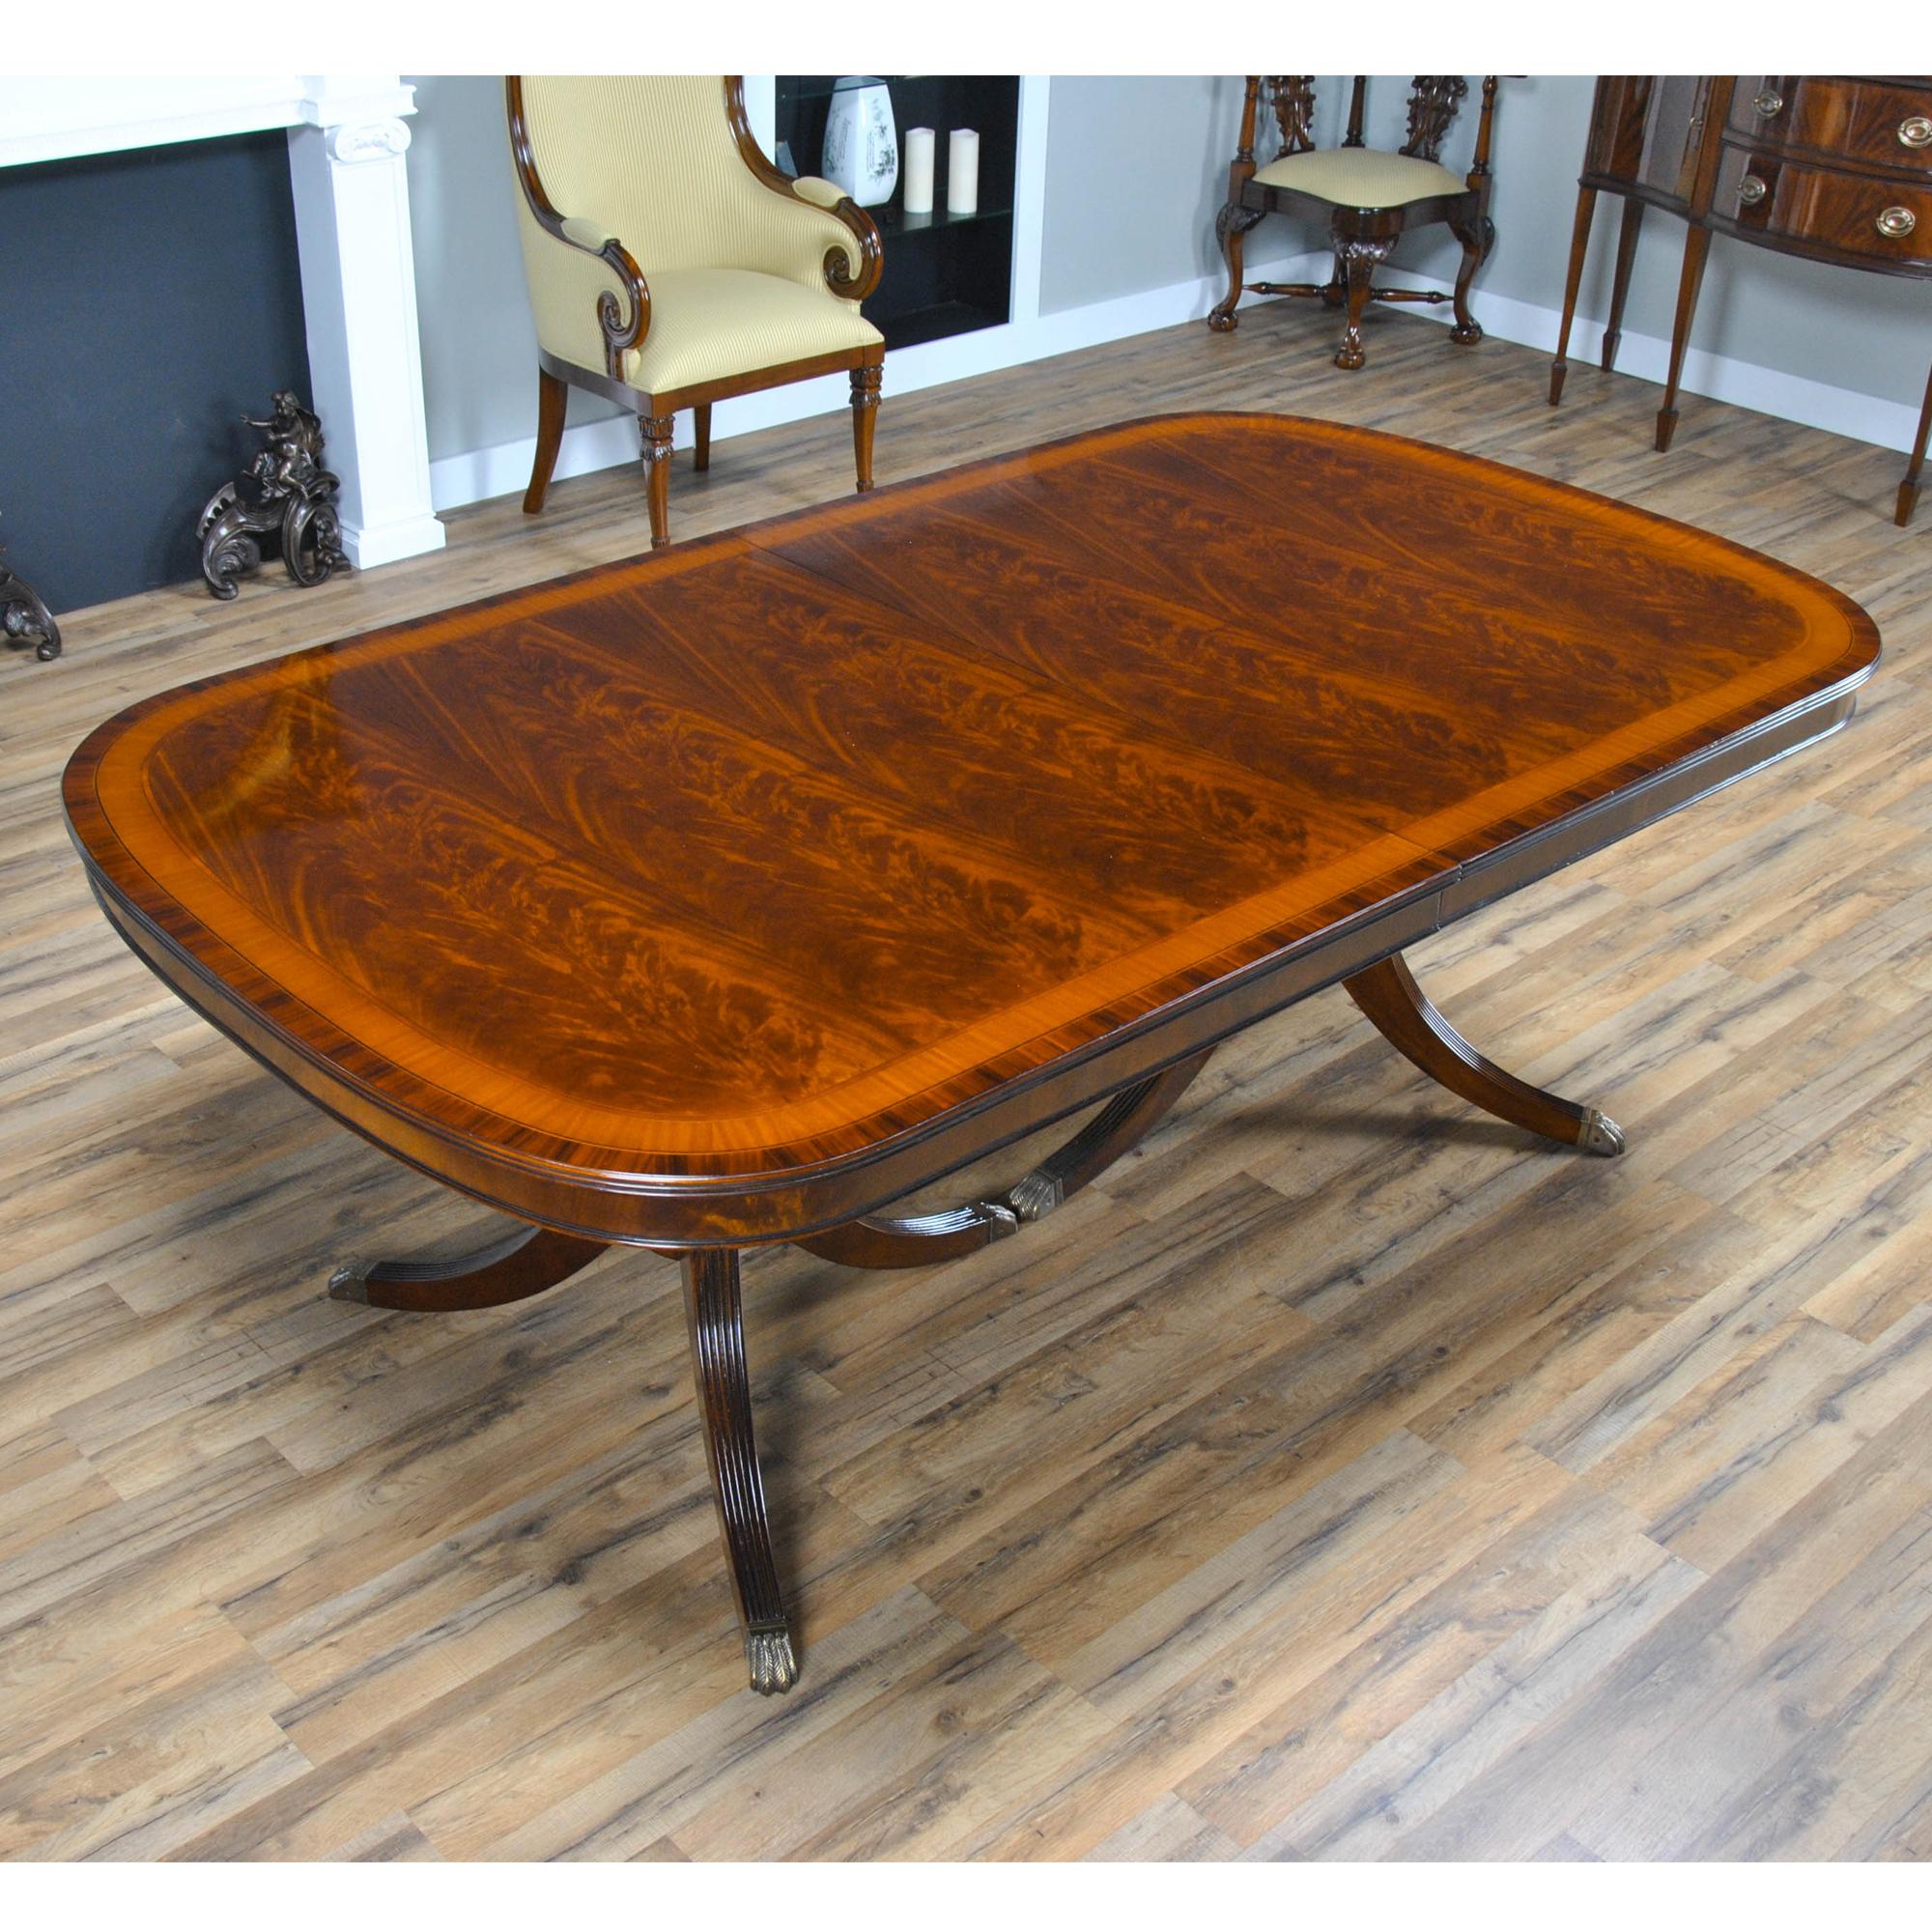 15 Foot Mahogany Dining Table Ndrt033